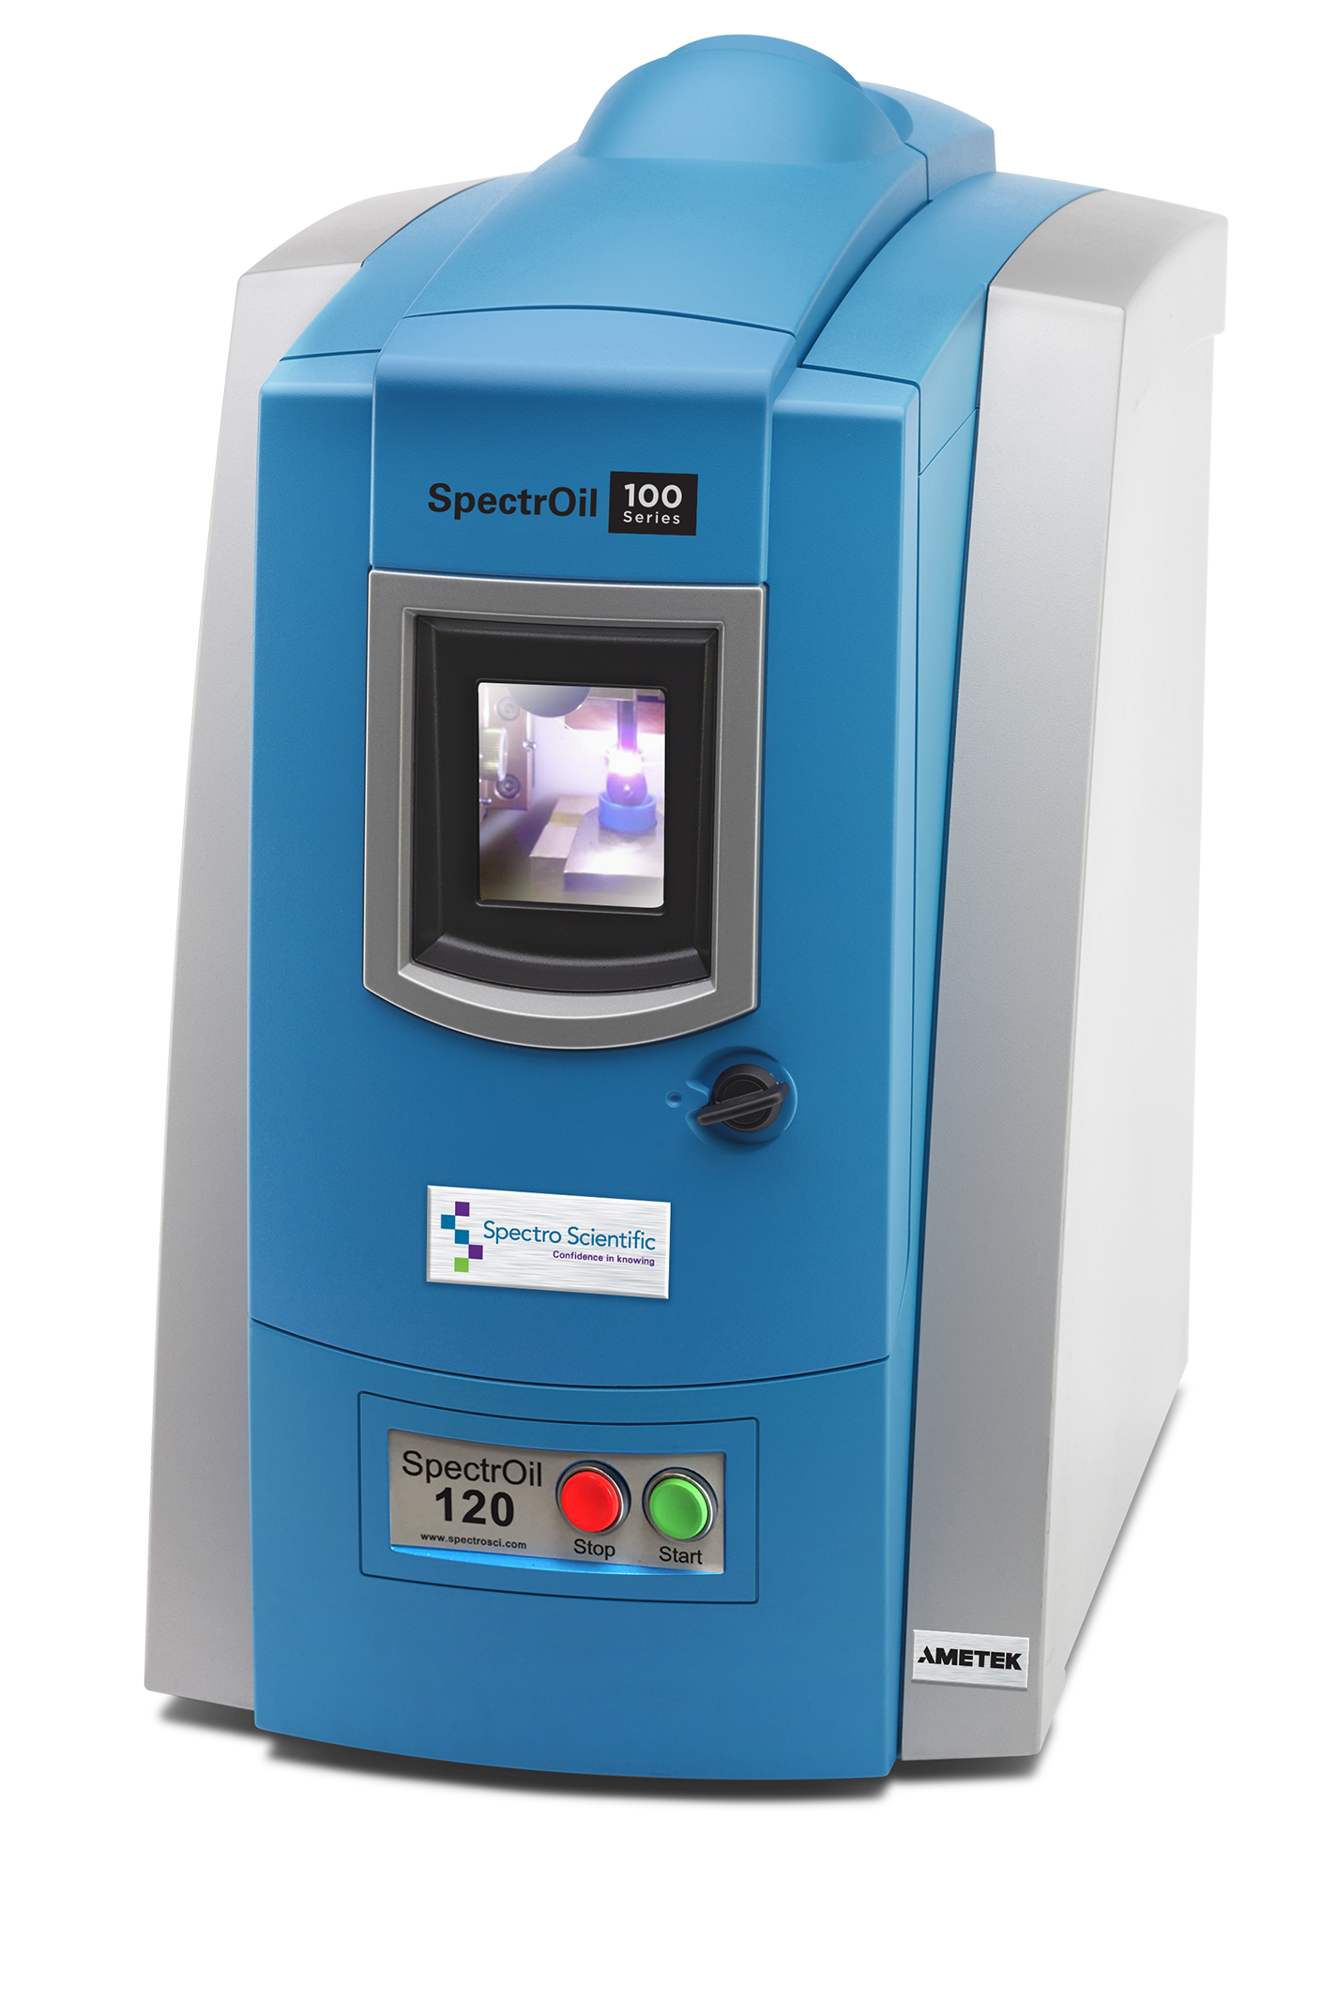 SpectrOil 100 Series elemental analyzer